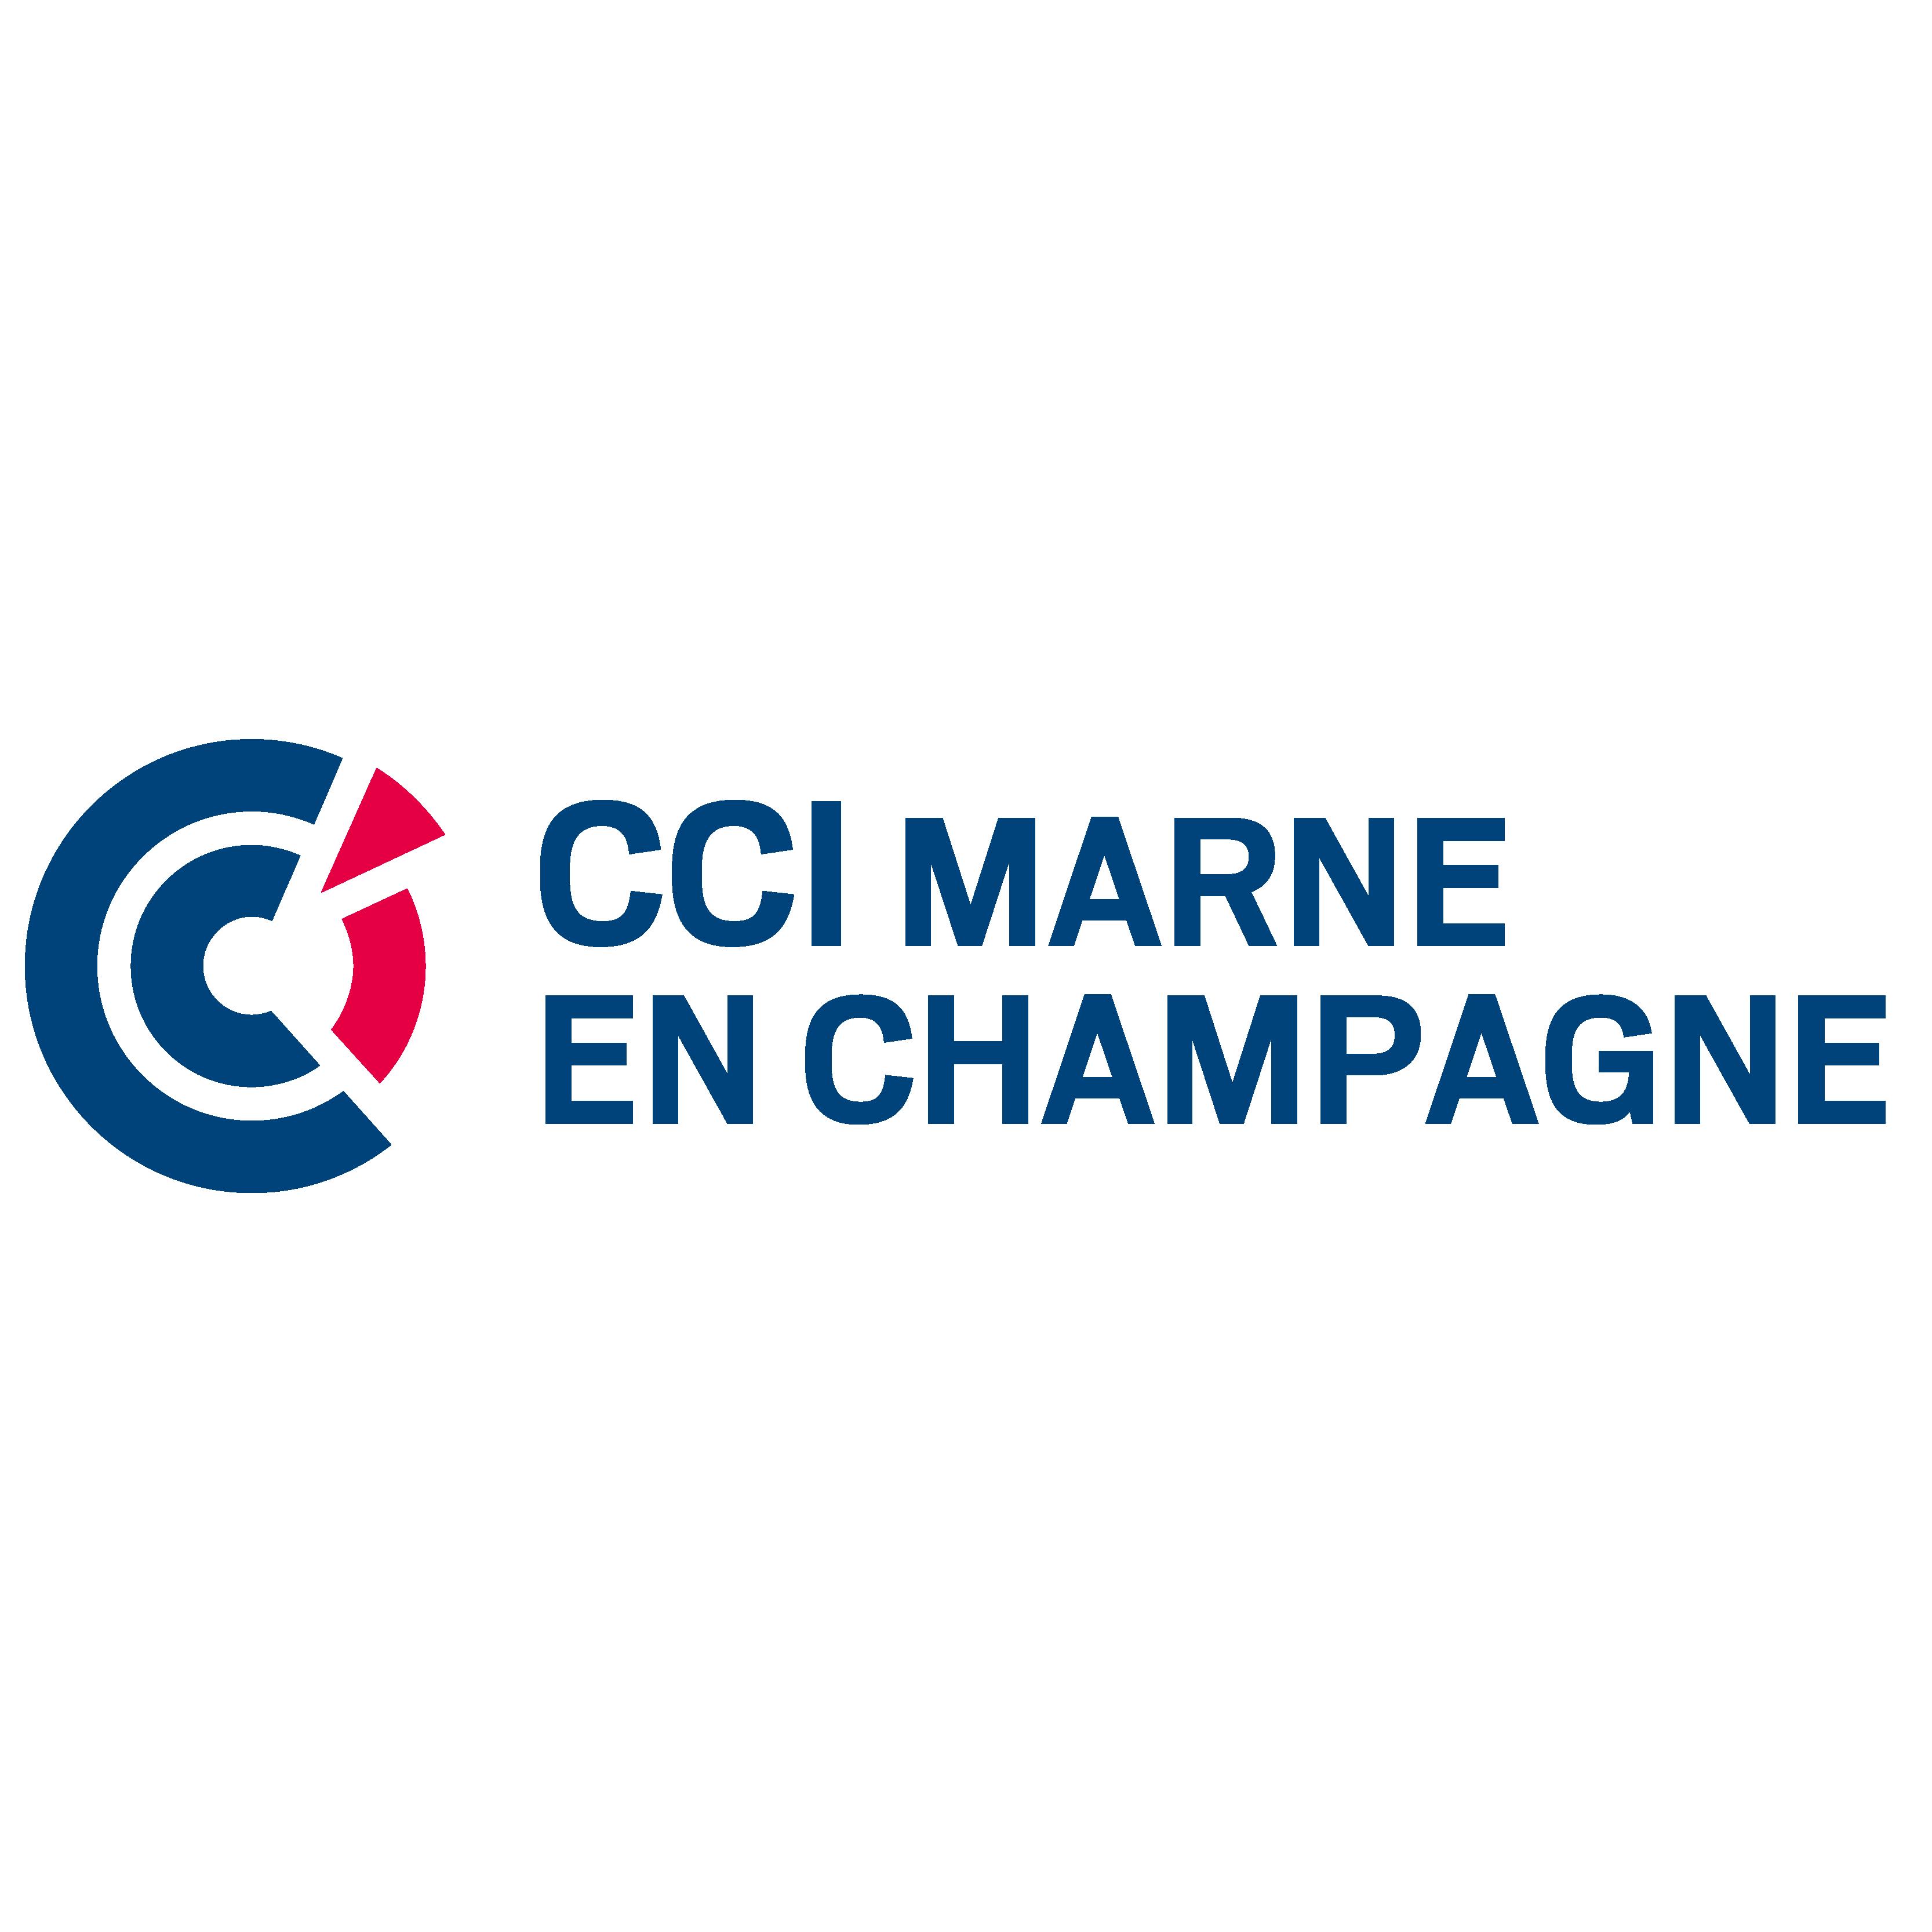 Logo CCI Marne en champagne partenaire de MCVAIC